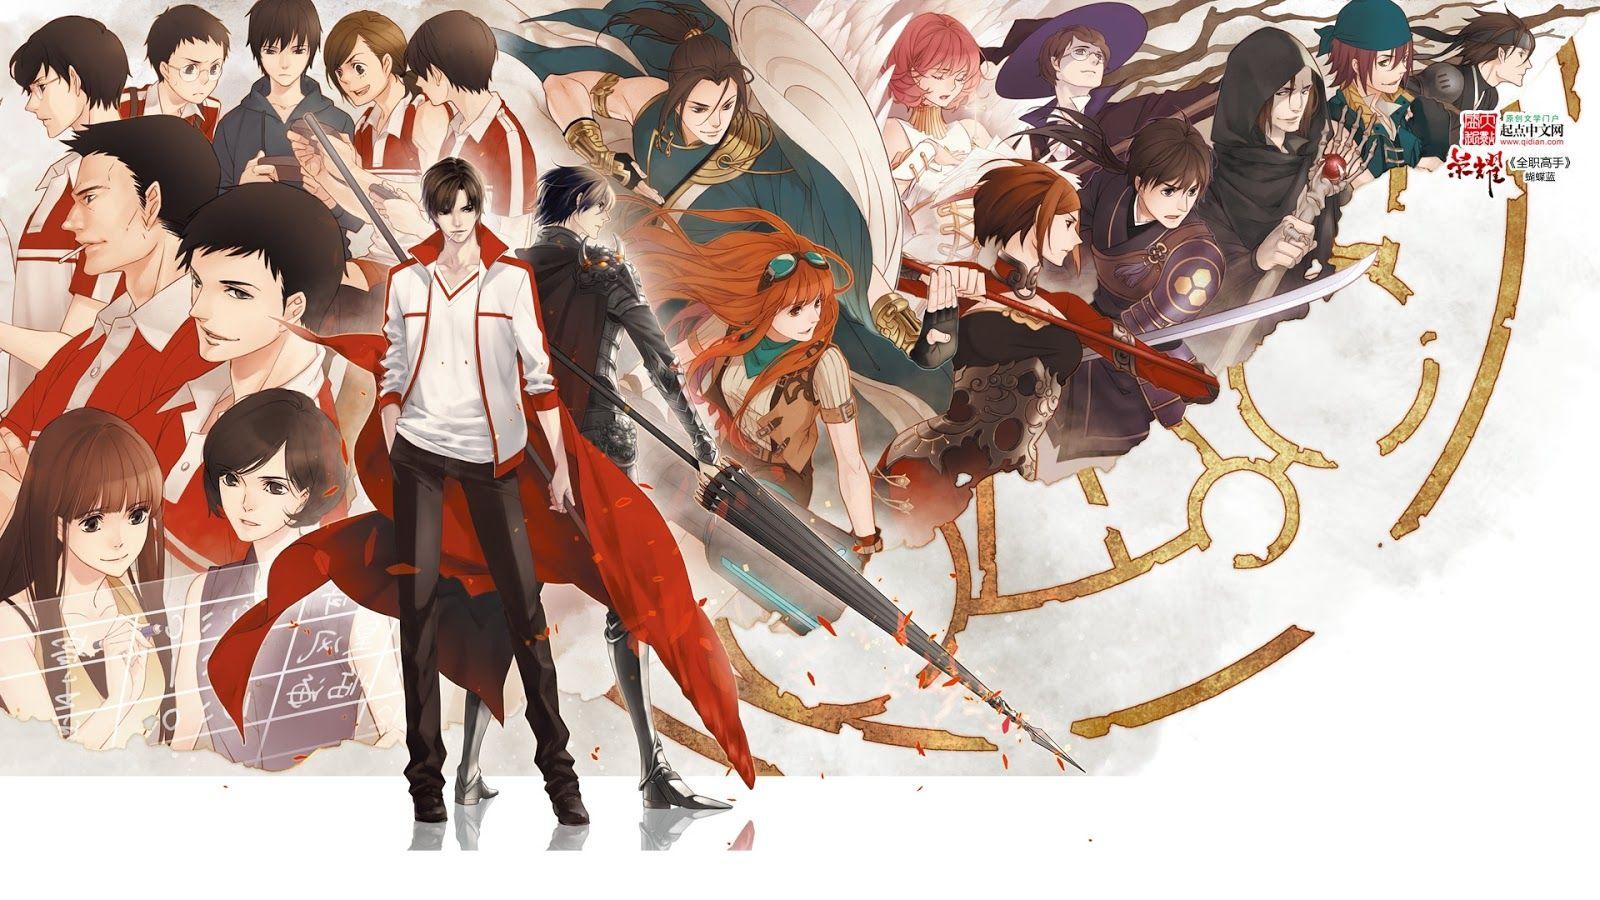 Review Anime Quan Zhi Gao Shou Japanimeindo The Kings Avatar Anime Caras